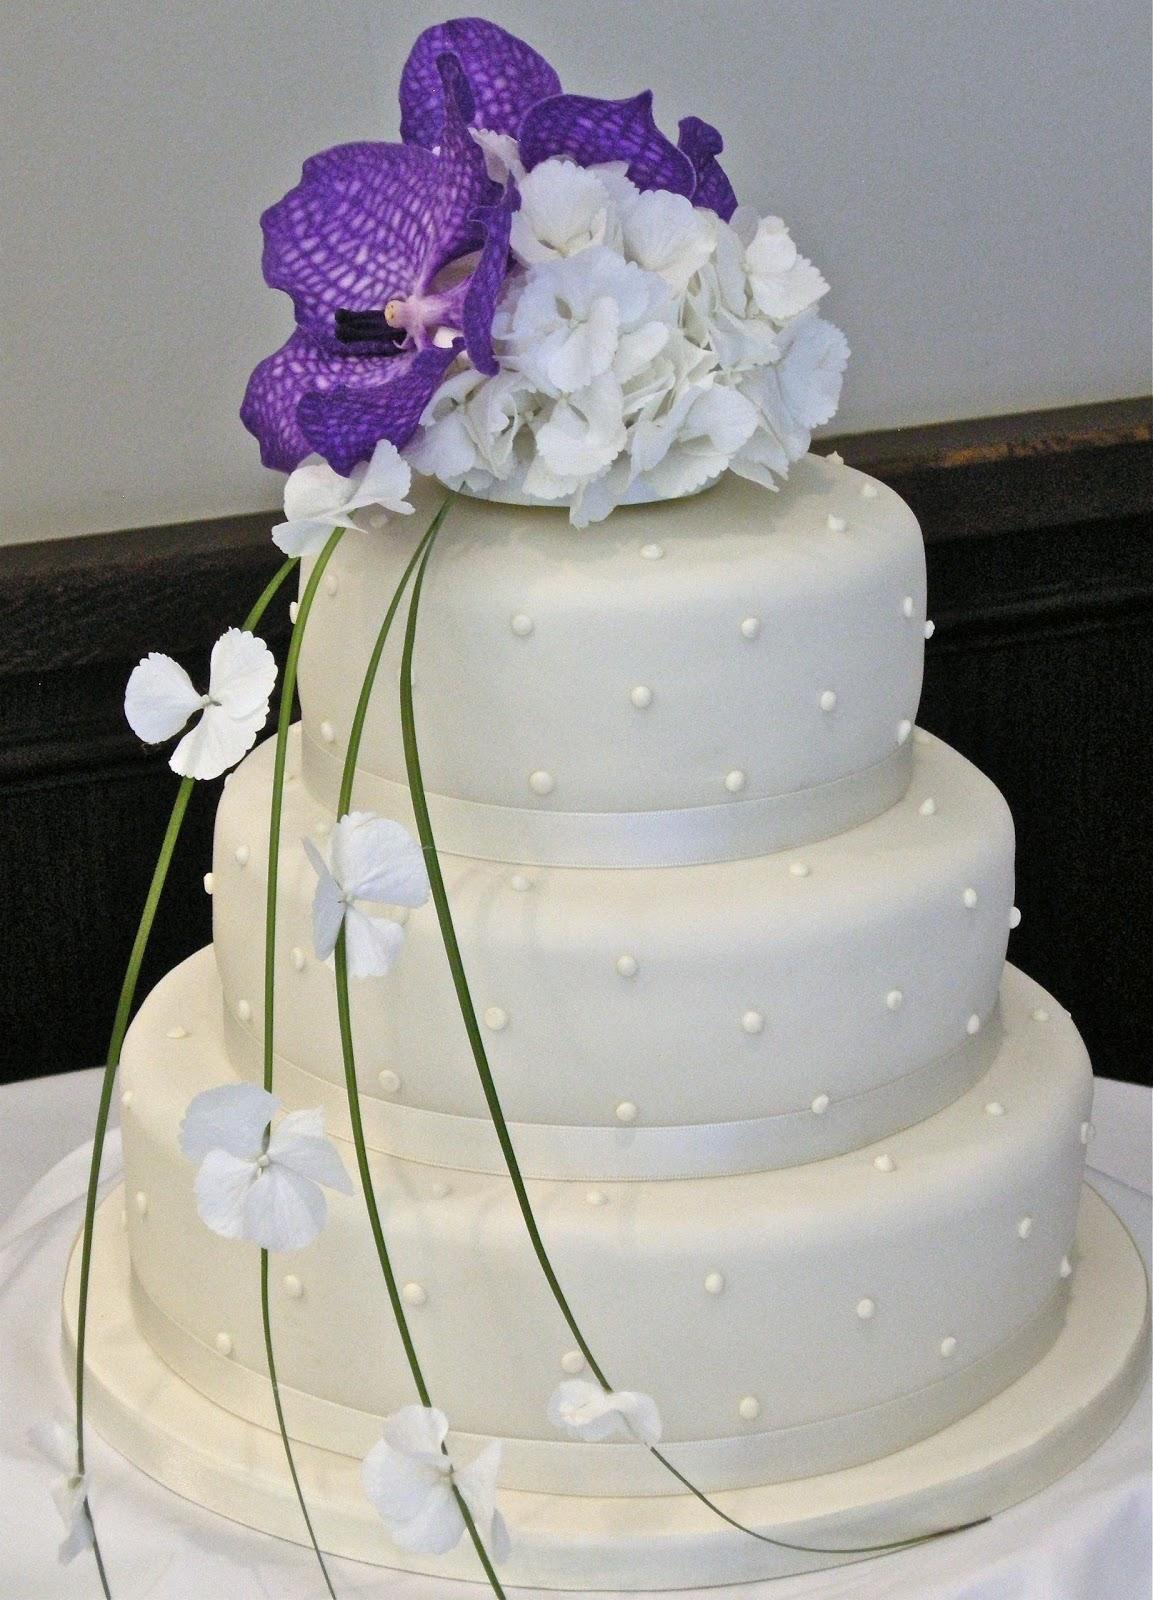 Letha\'s blog: 3 Tier Wedding cakes-Purple n